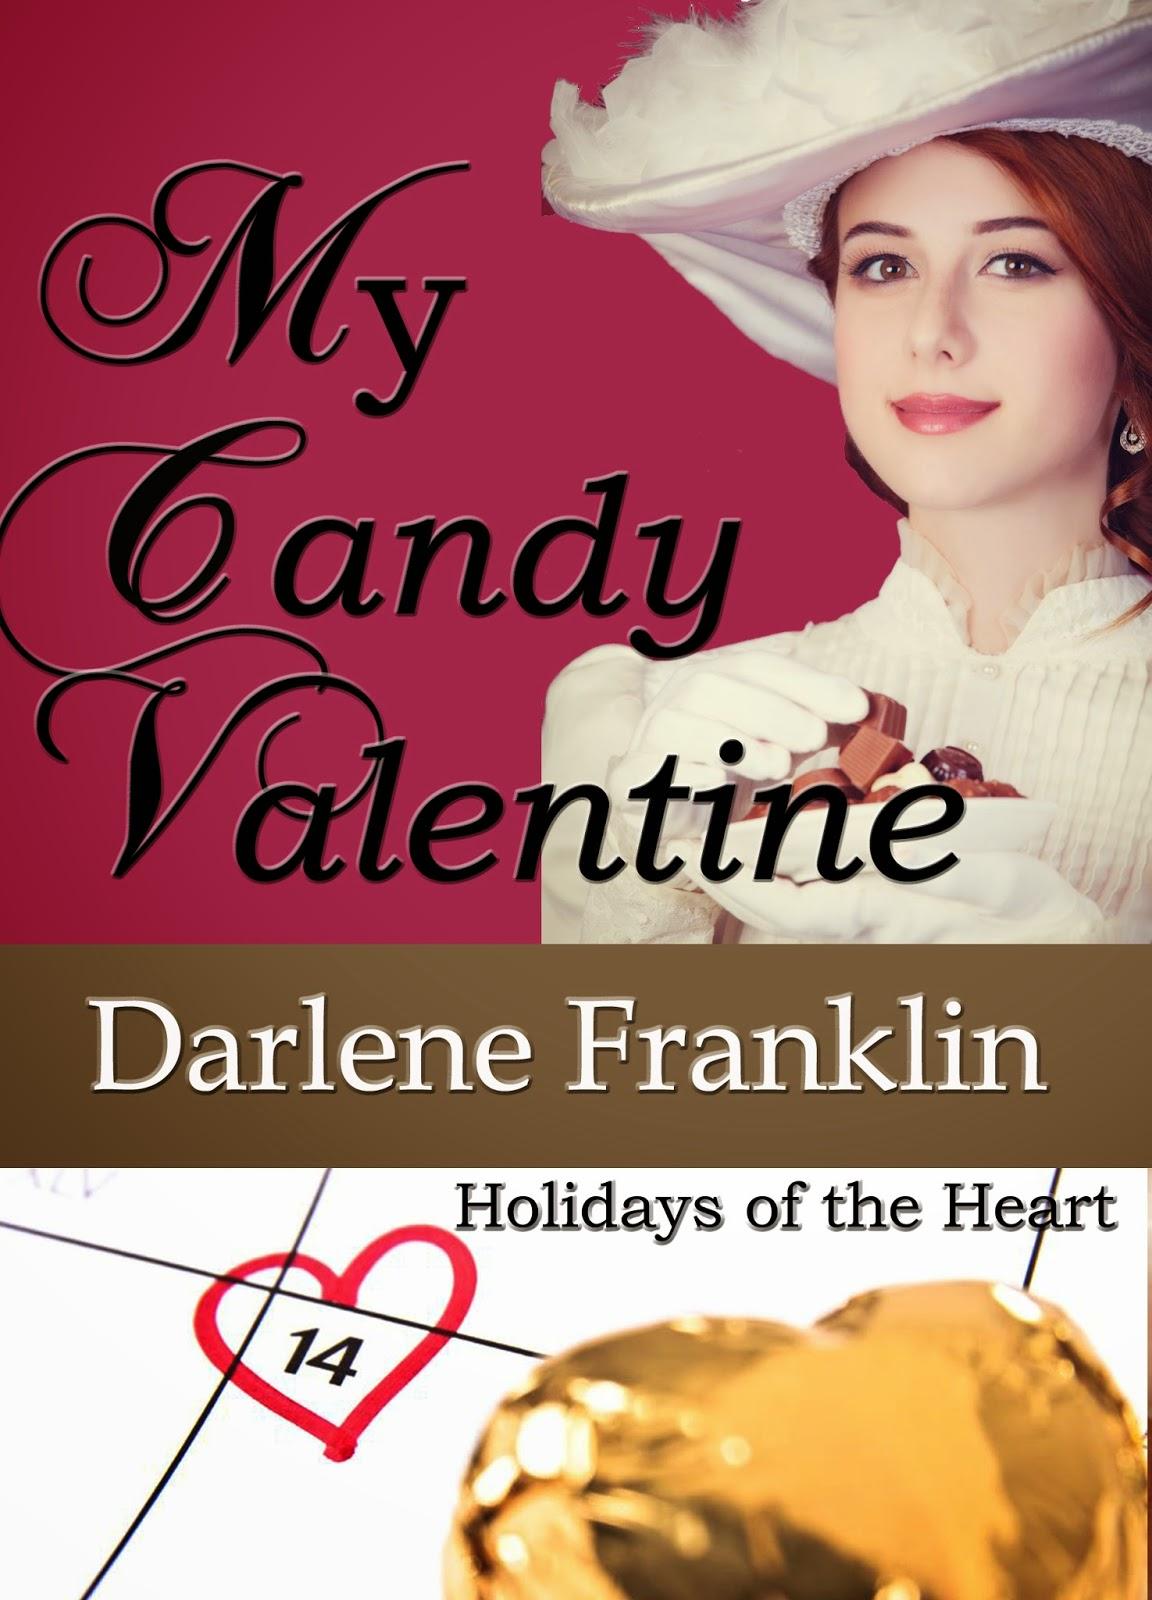 http://www.amazon.com/Candy-Valentine-Holidays-Heart-Book-ebook/dp/B00SI2214K/ref=sr_1_1?s=books&ie=UTF8&qid=1423679865&sr=1-1&keywords=my+candy+valentine+darlene+franklin